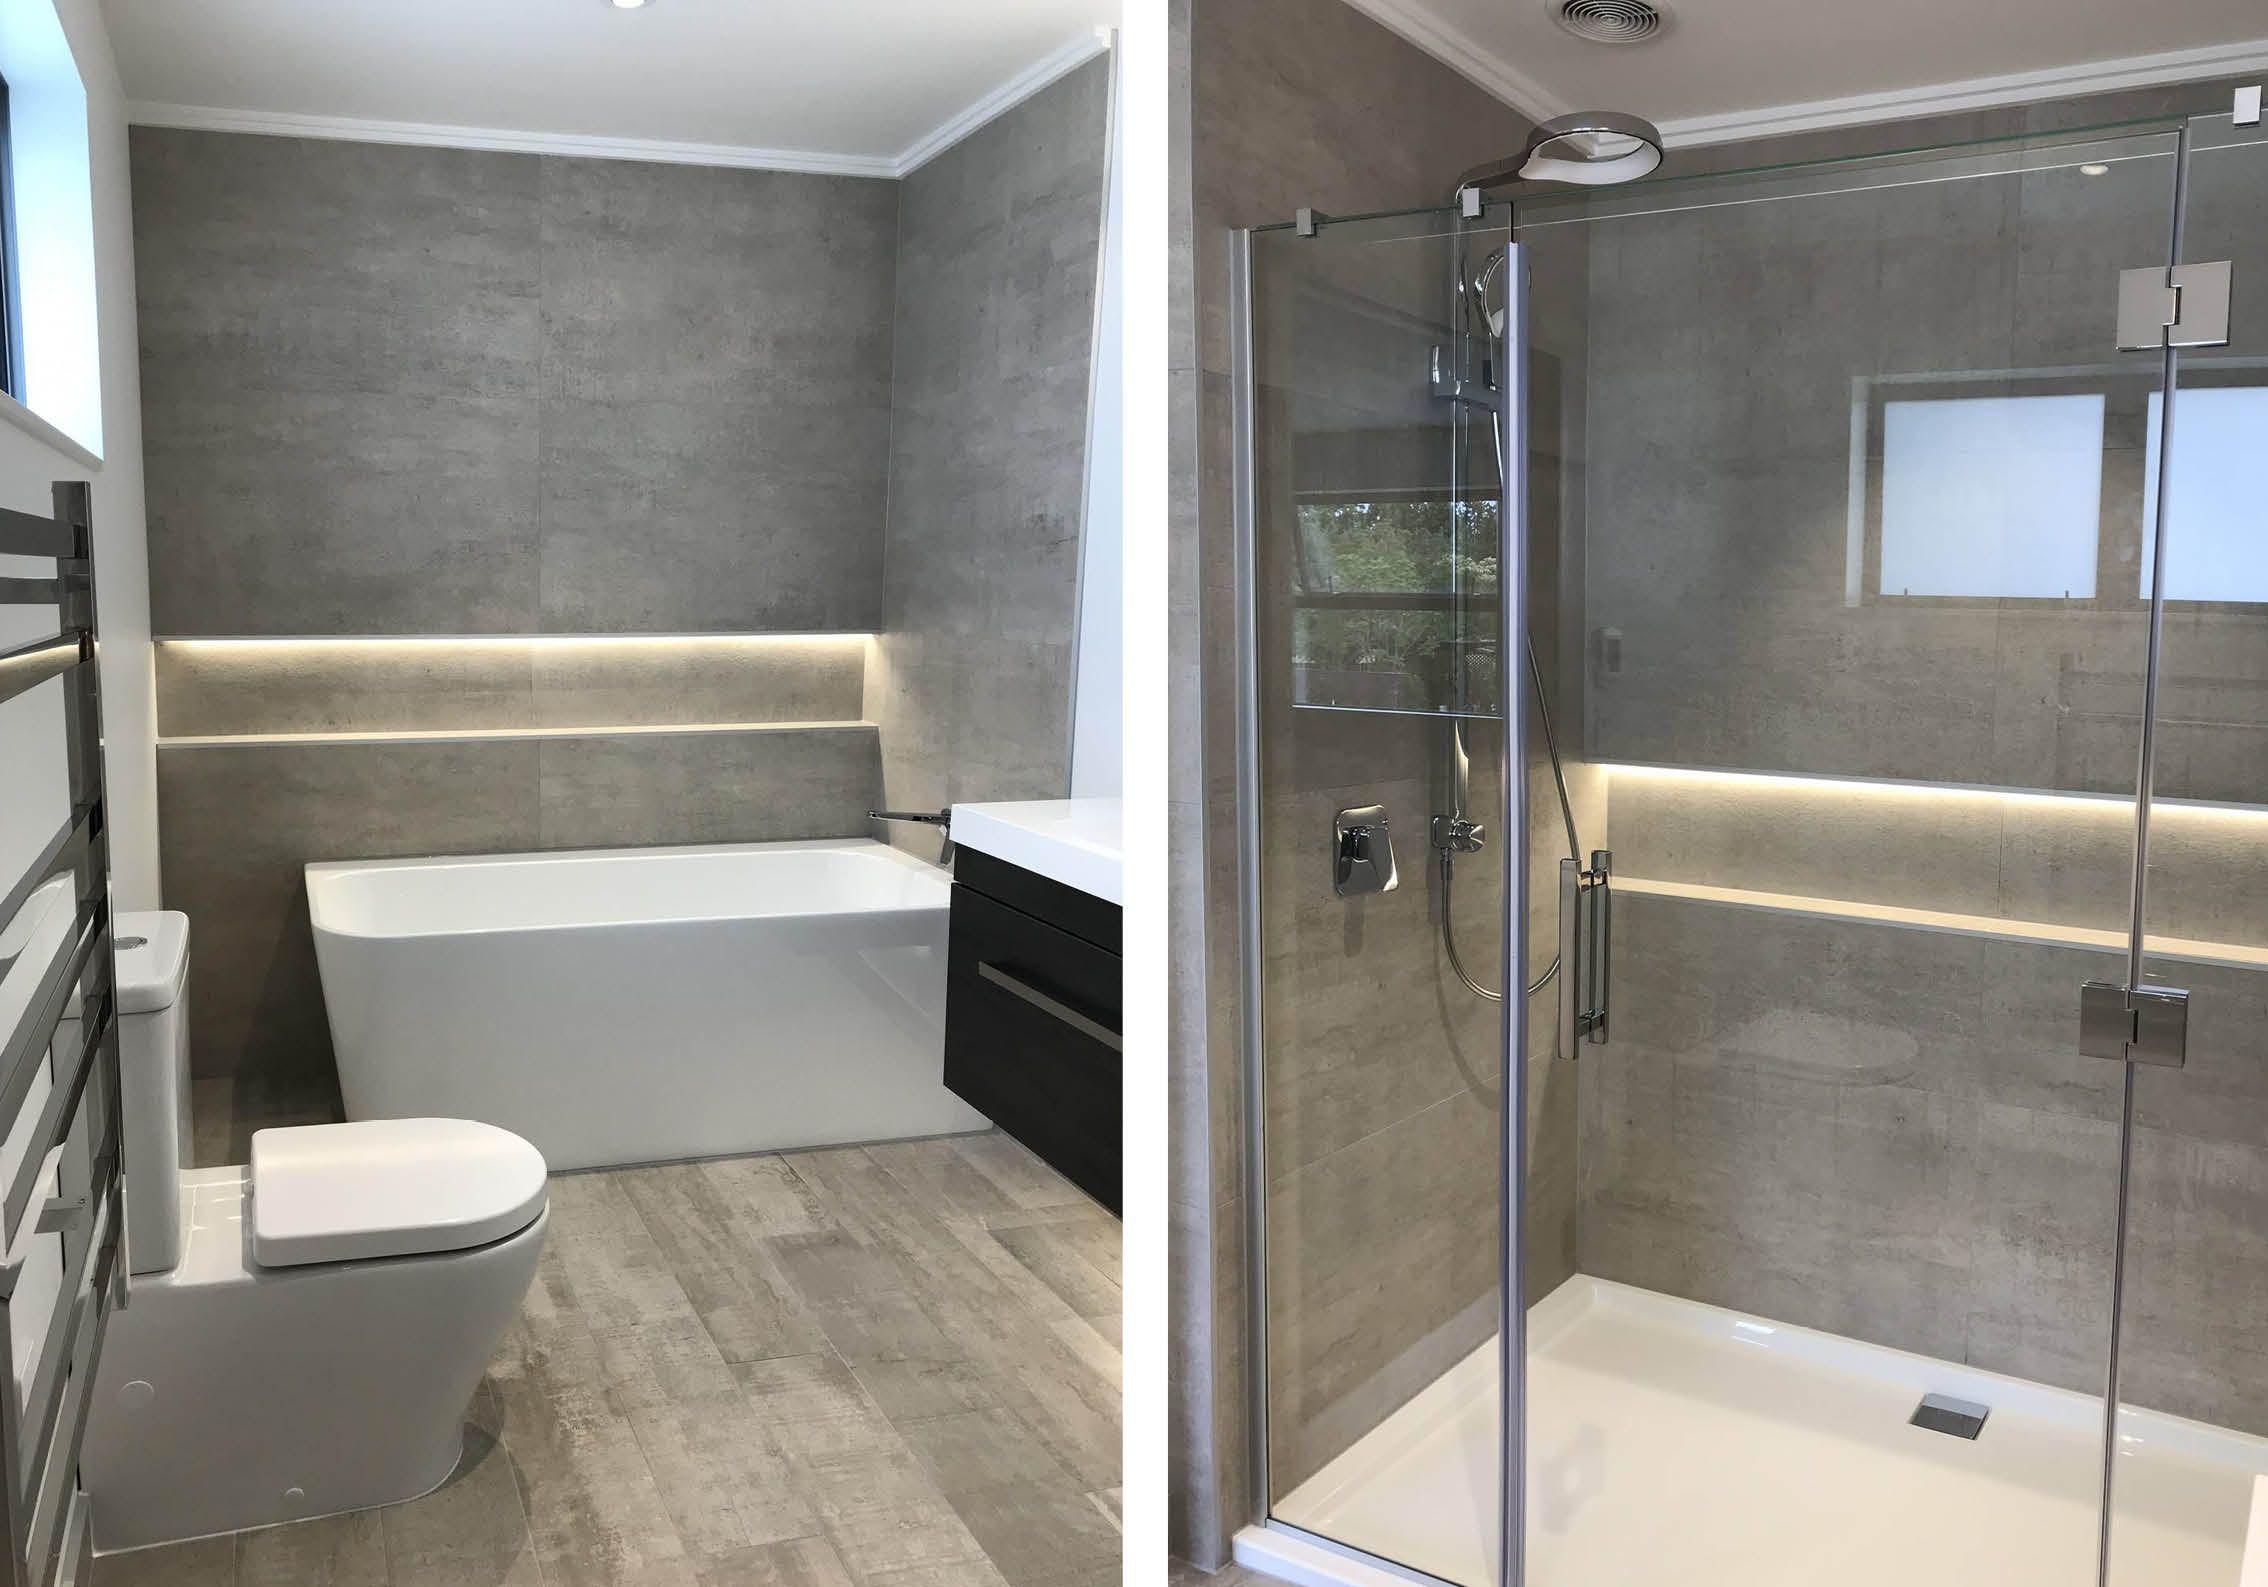 Concreto Cinza 60x120 Bathroom Floor Tiles Bathroom Floor Cabinets Best Bathroom Tiles